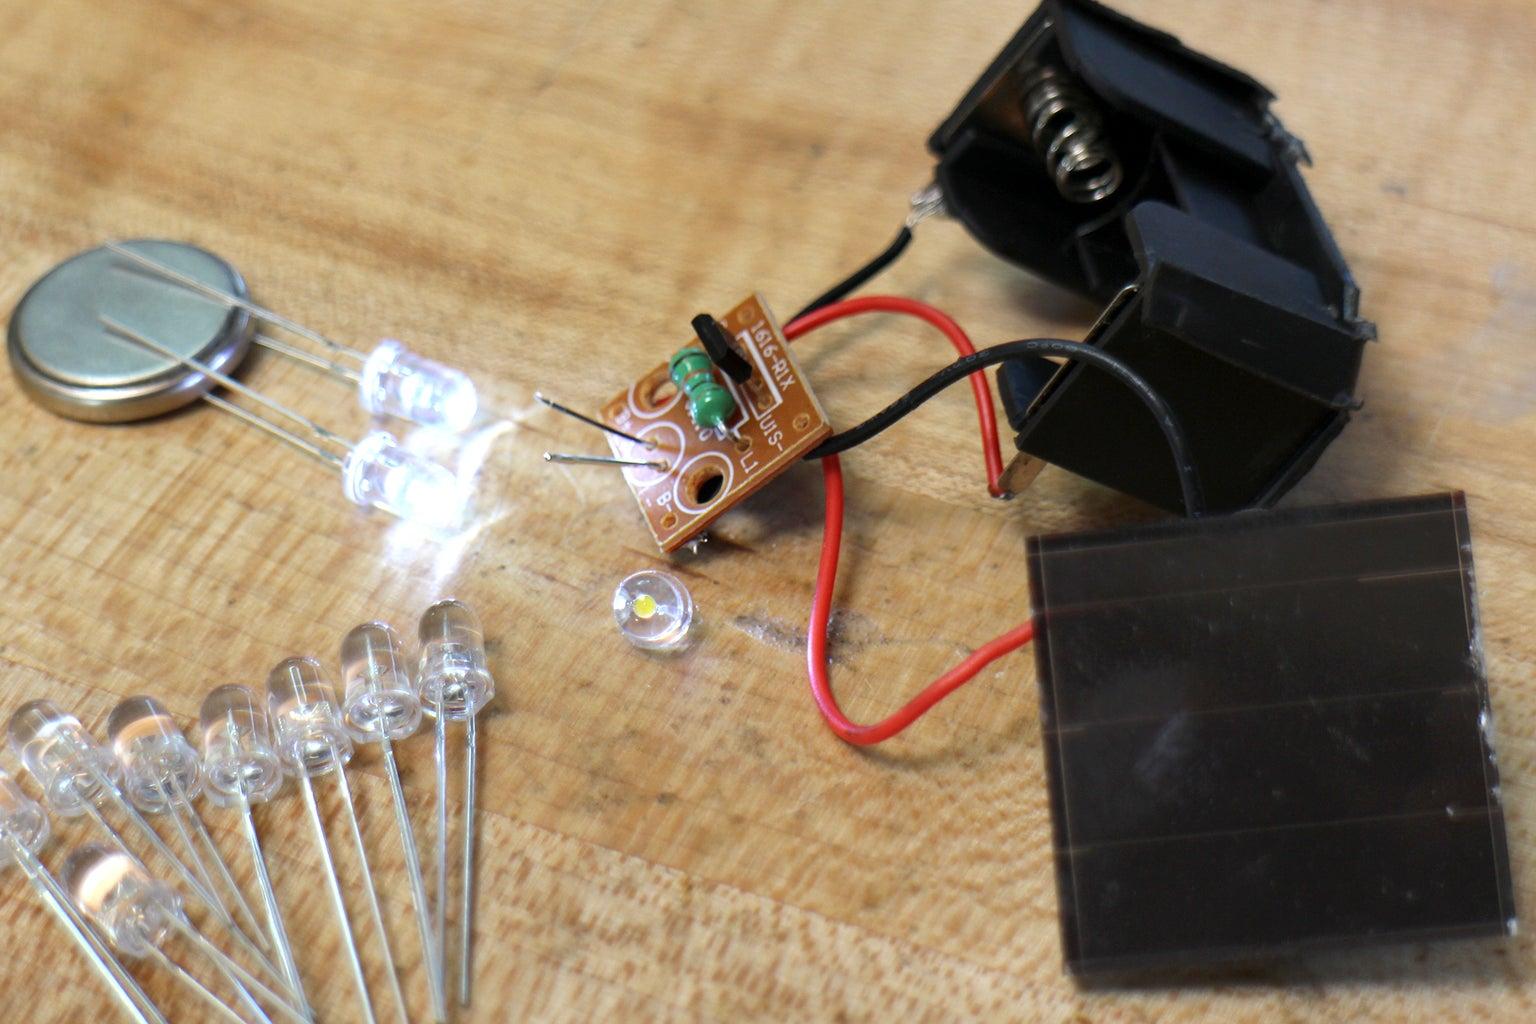 Modify LED Lights to Have More LEDs